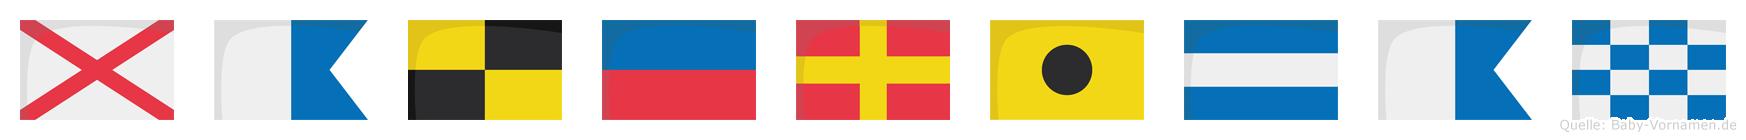 Valerijan im Flaggenalphabet